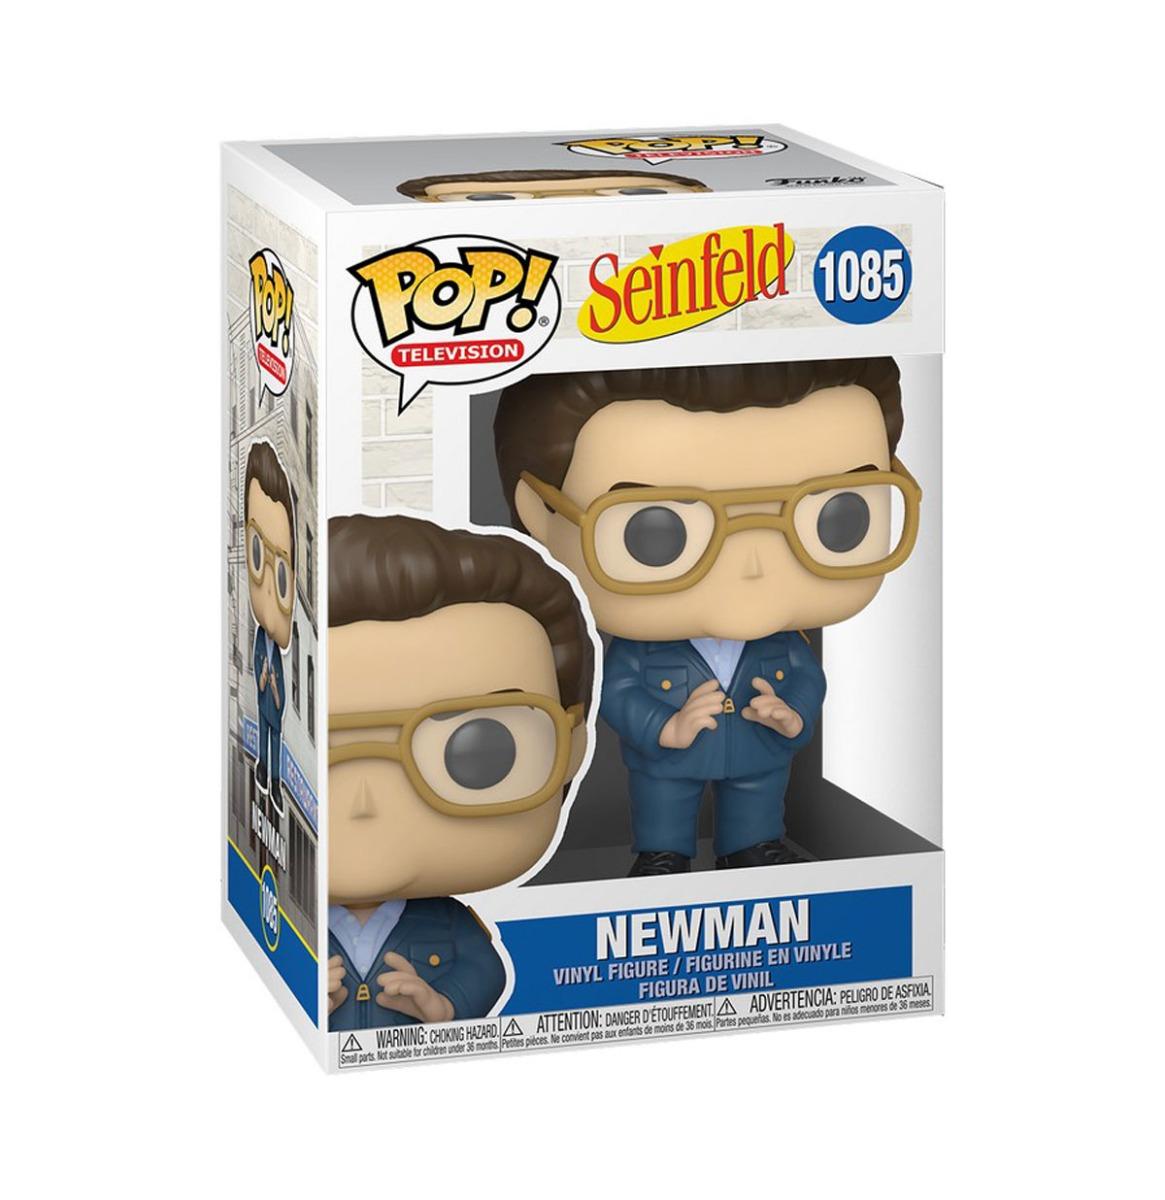 Funko Pop! TV: Seinfeld - Newman the Mailman